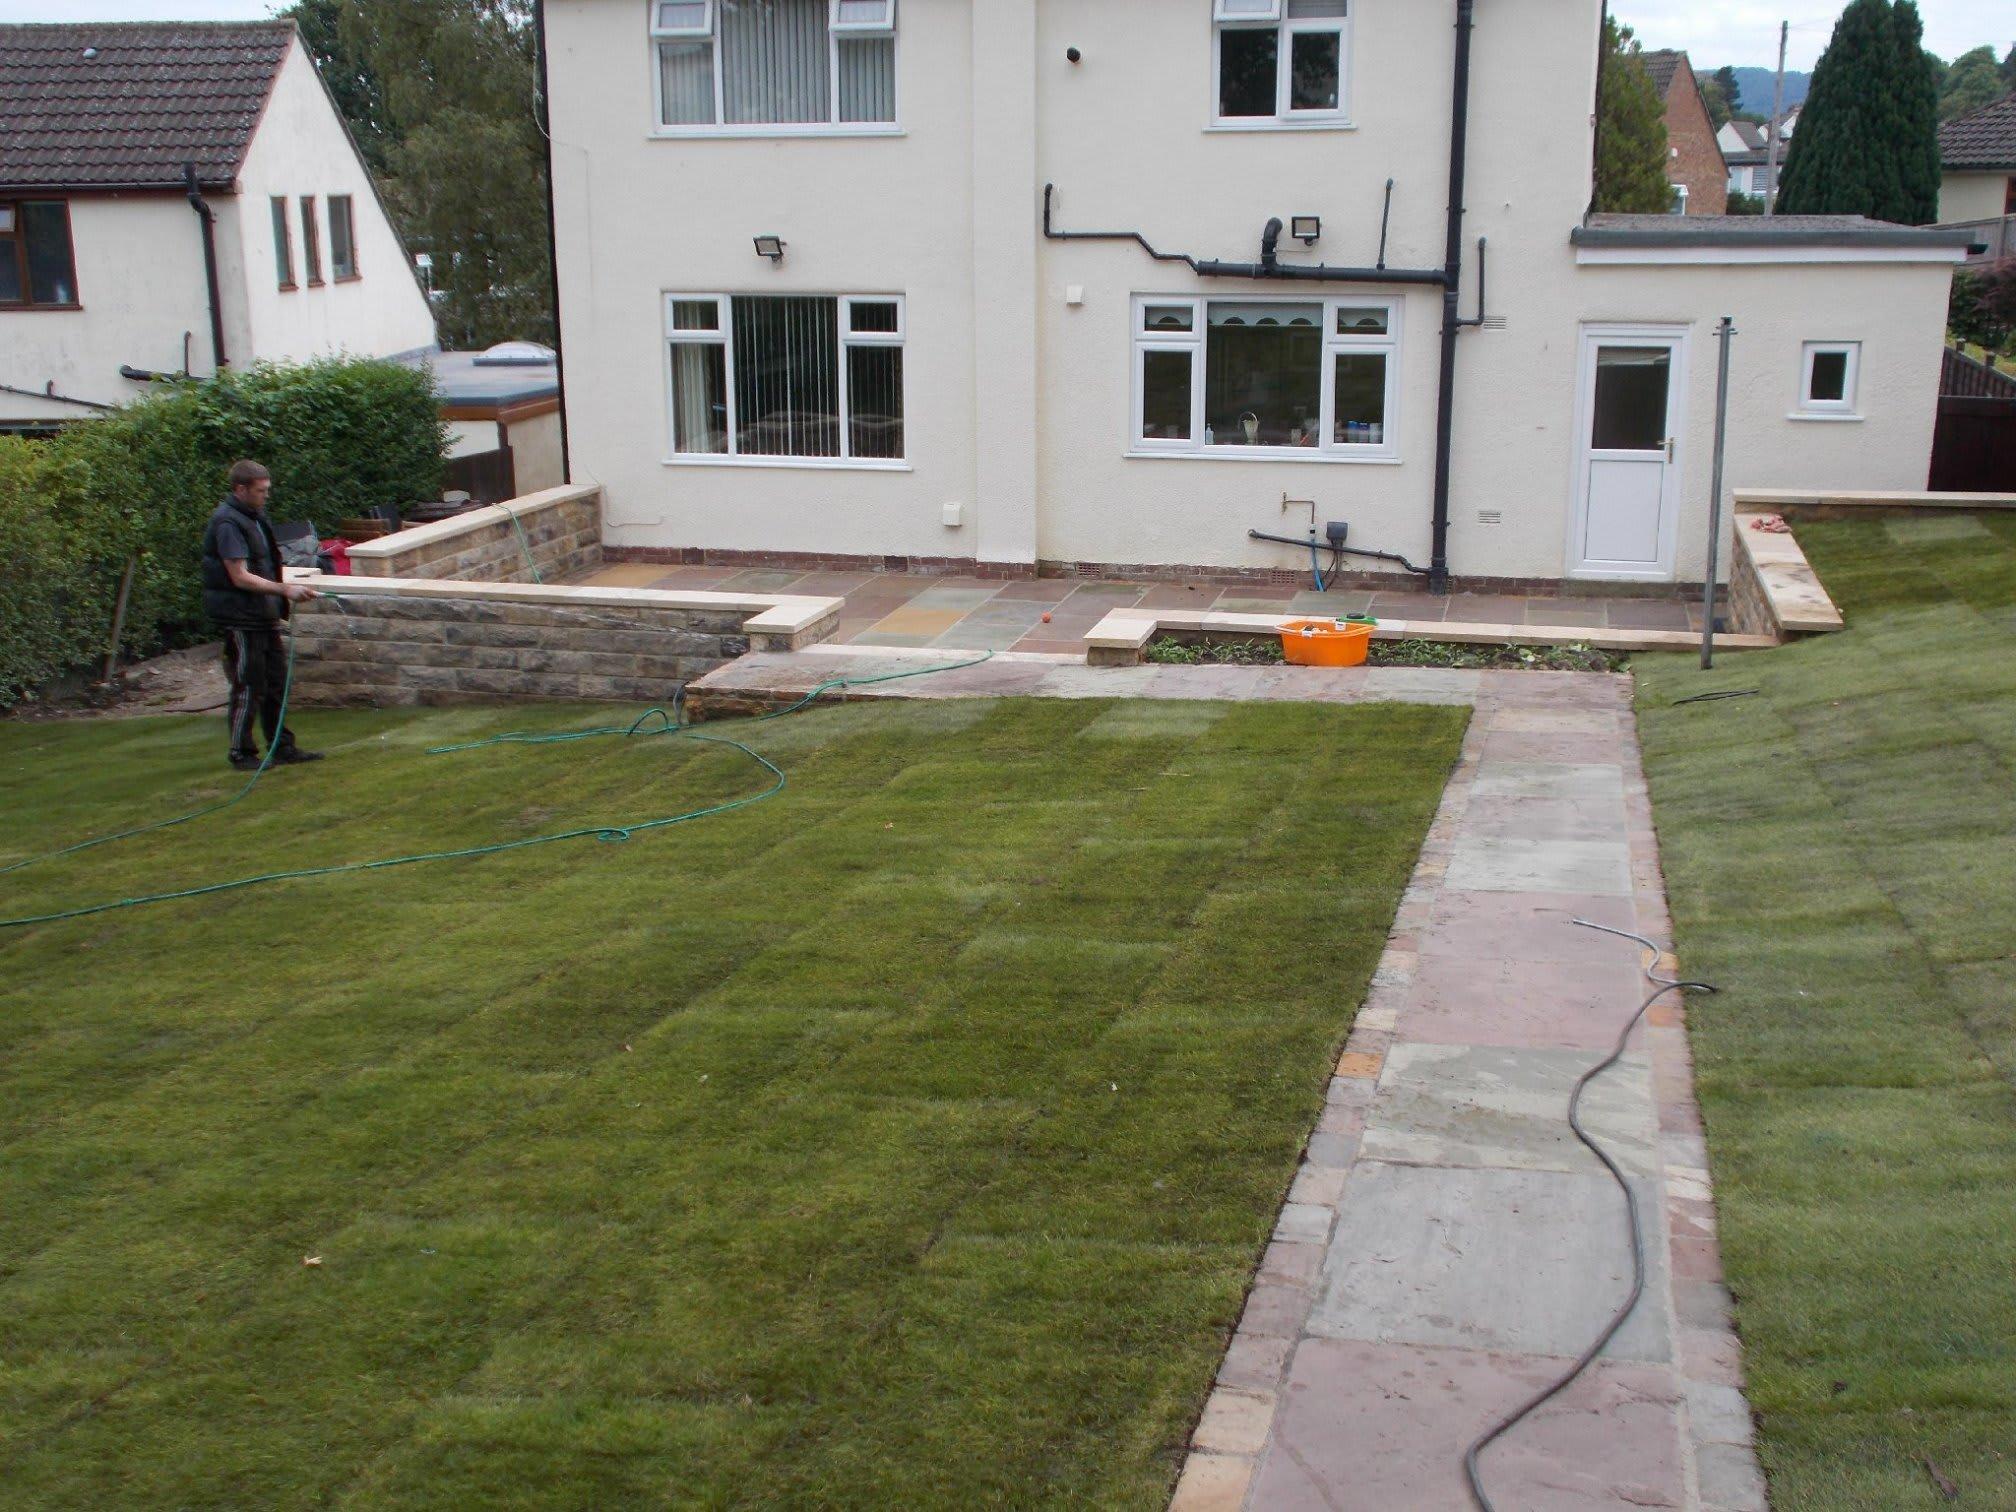 Turf Supplies Quality Lawn Turf & Top Soil Suppliers | Wood Yard Bingley Lee Lane, Bingley BD16 1UE | +44 7500 193025